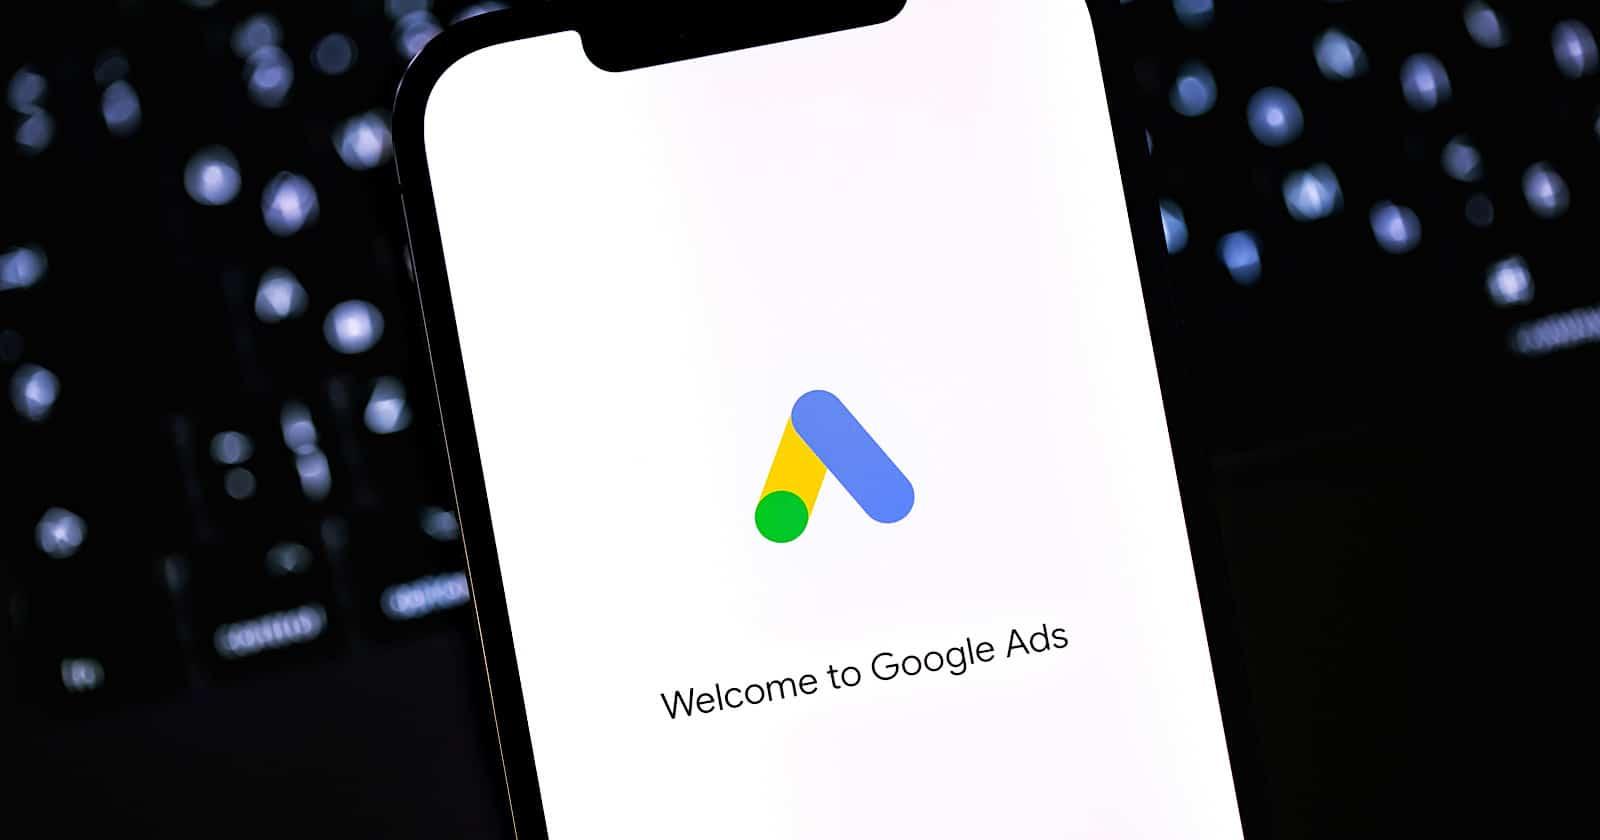 Google Ads App Gets New Features After 3 Months of No Updates via @MattGSouthern